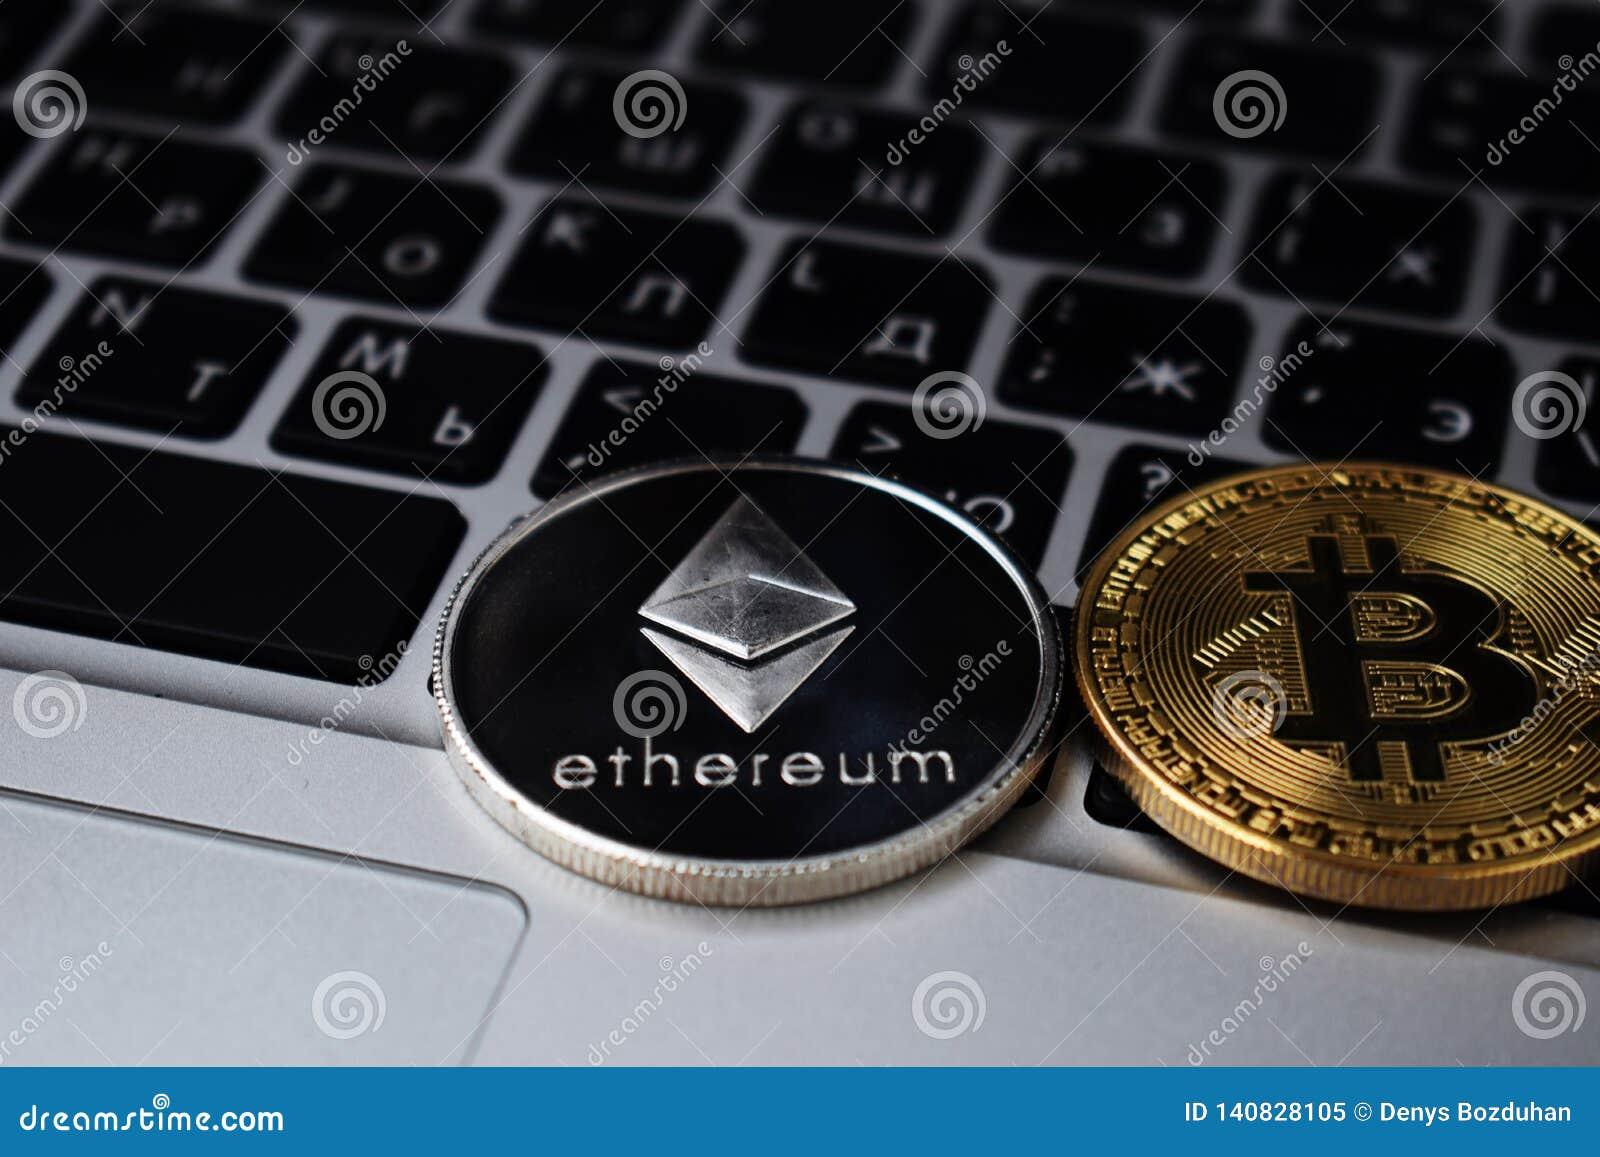 bitcoin uae kereskedelem bitcoin darab